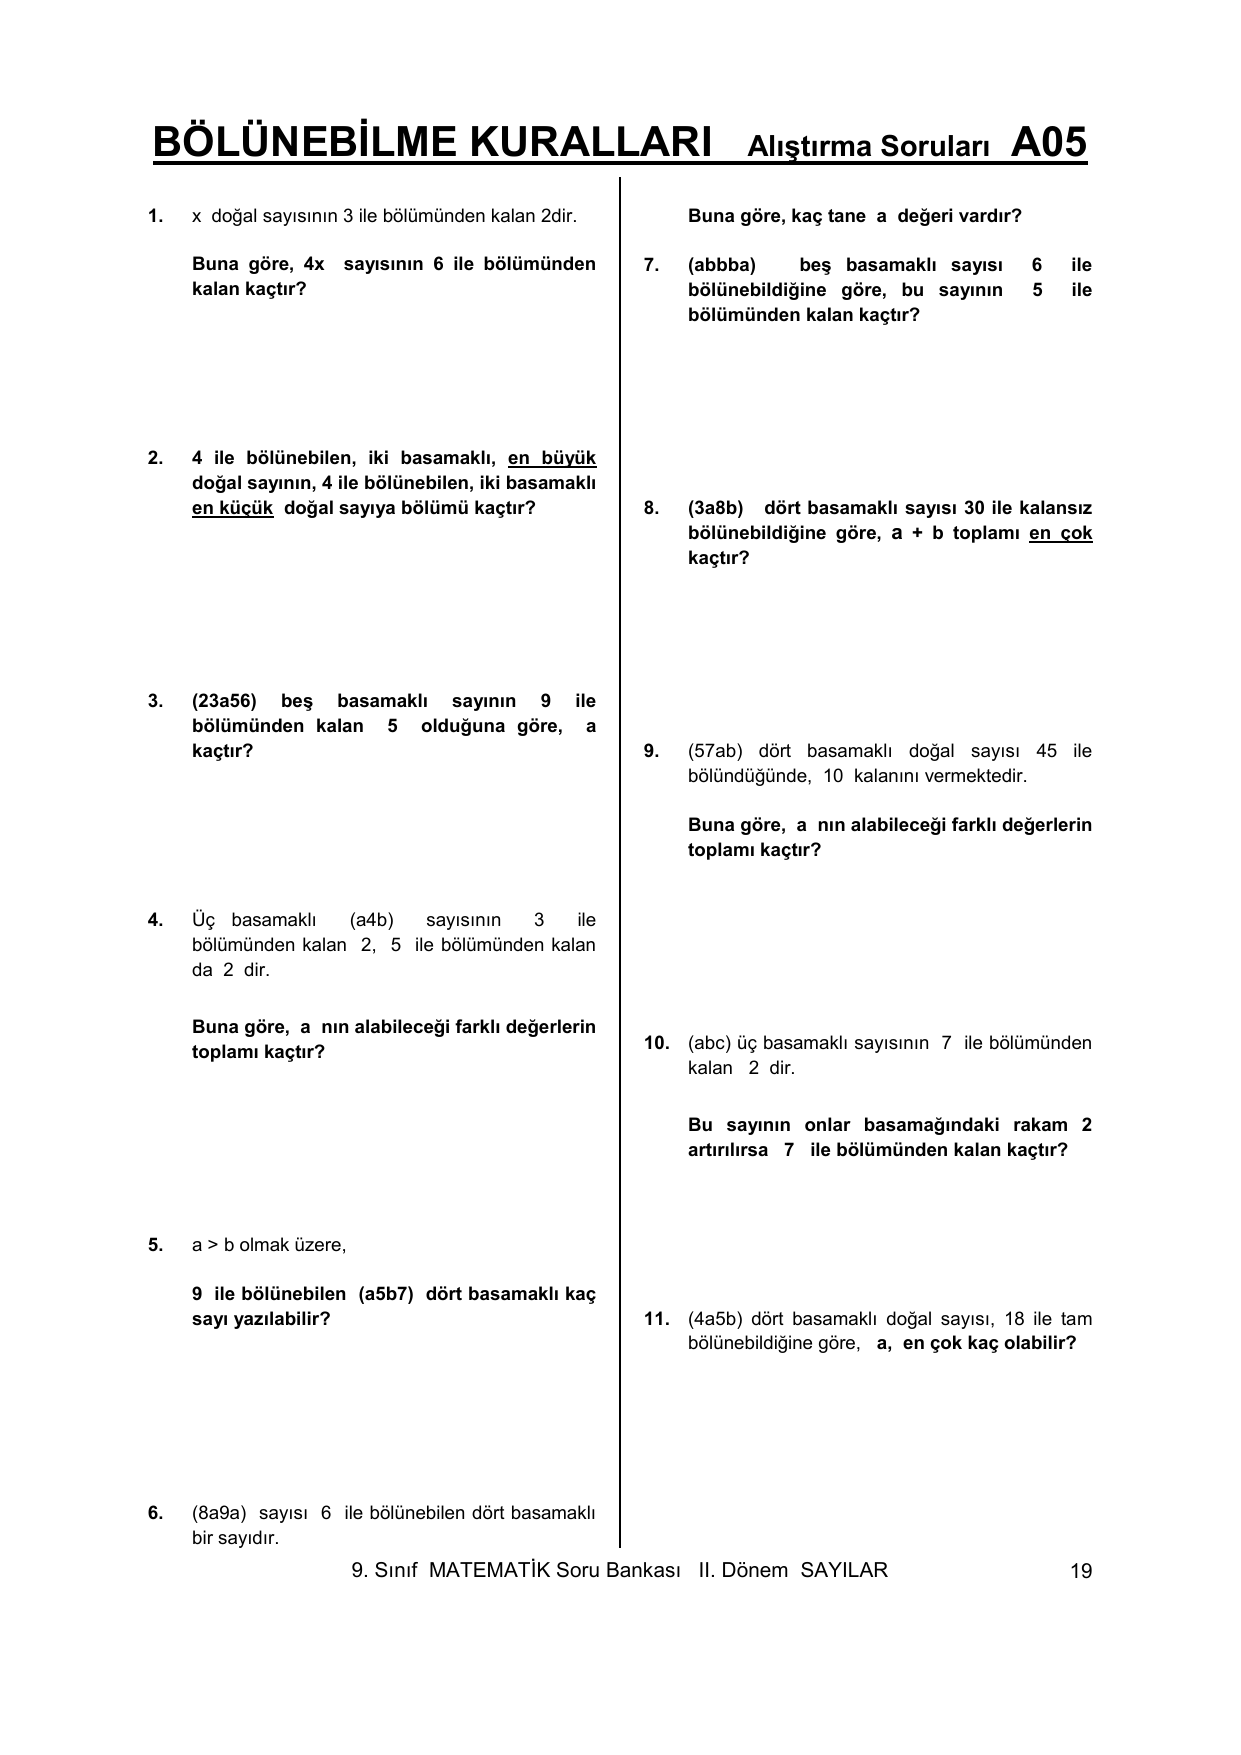 Bolunebilme Kurallari Alistirma Sorulari A05